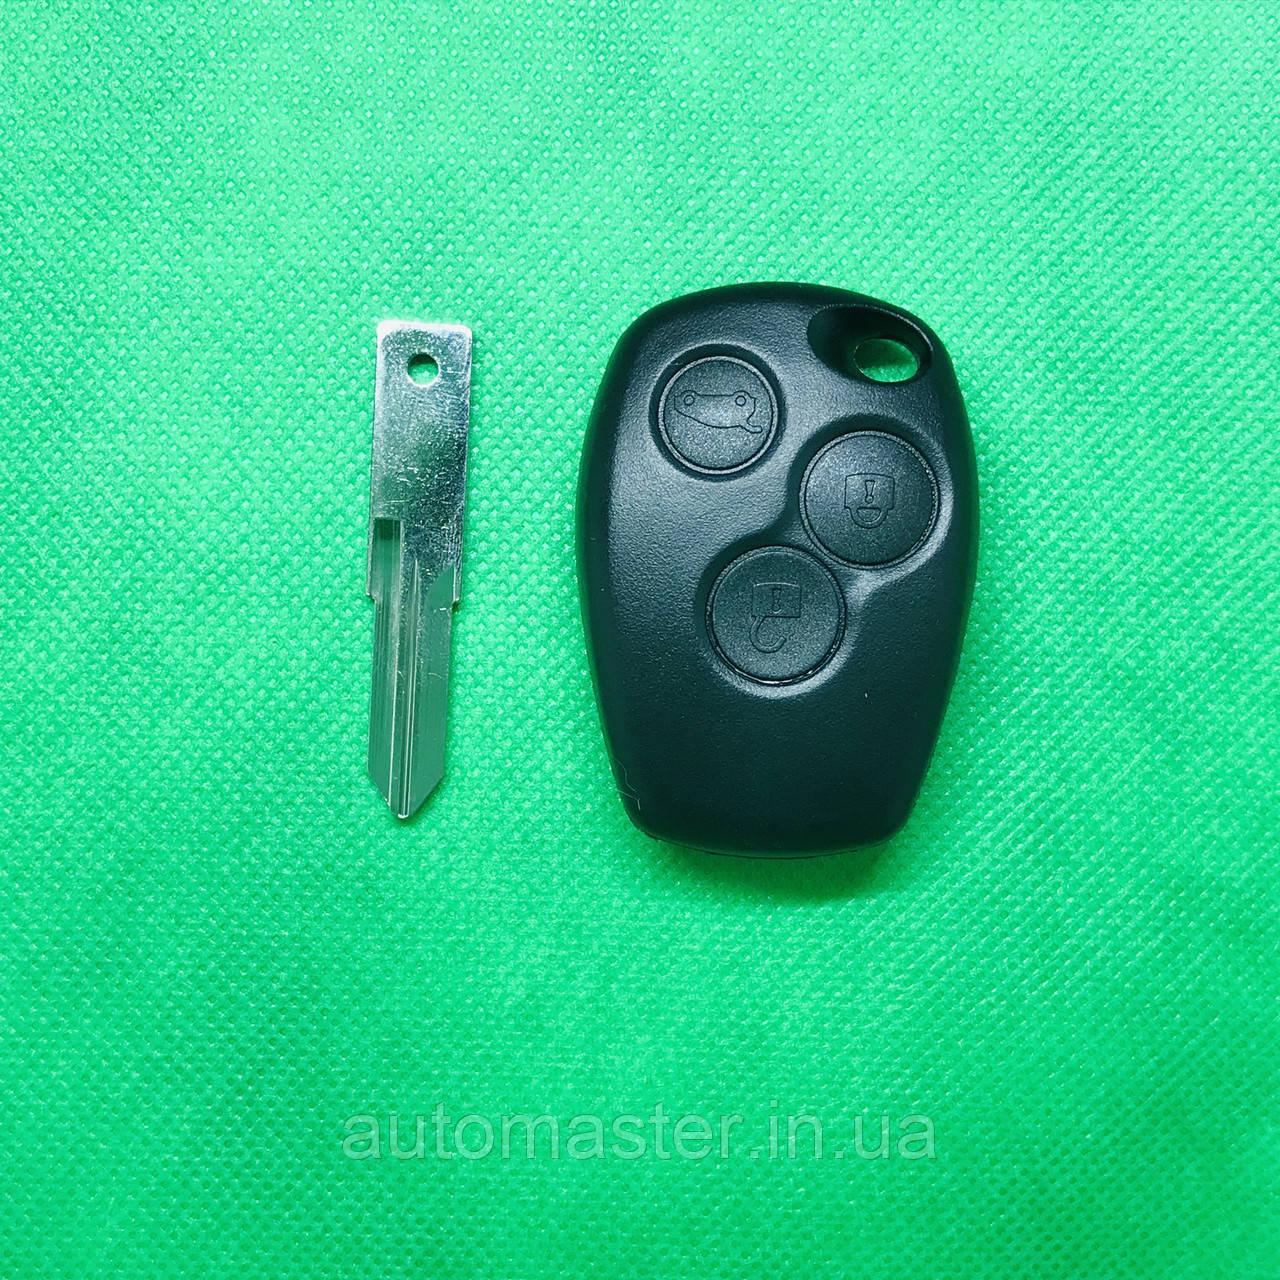 Корпус ключа для RENAULT (рено) Traffic Траффик 3 кнопки, лезвие VAC102